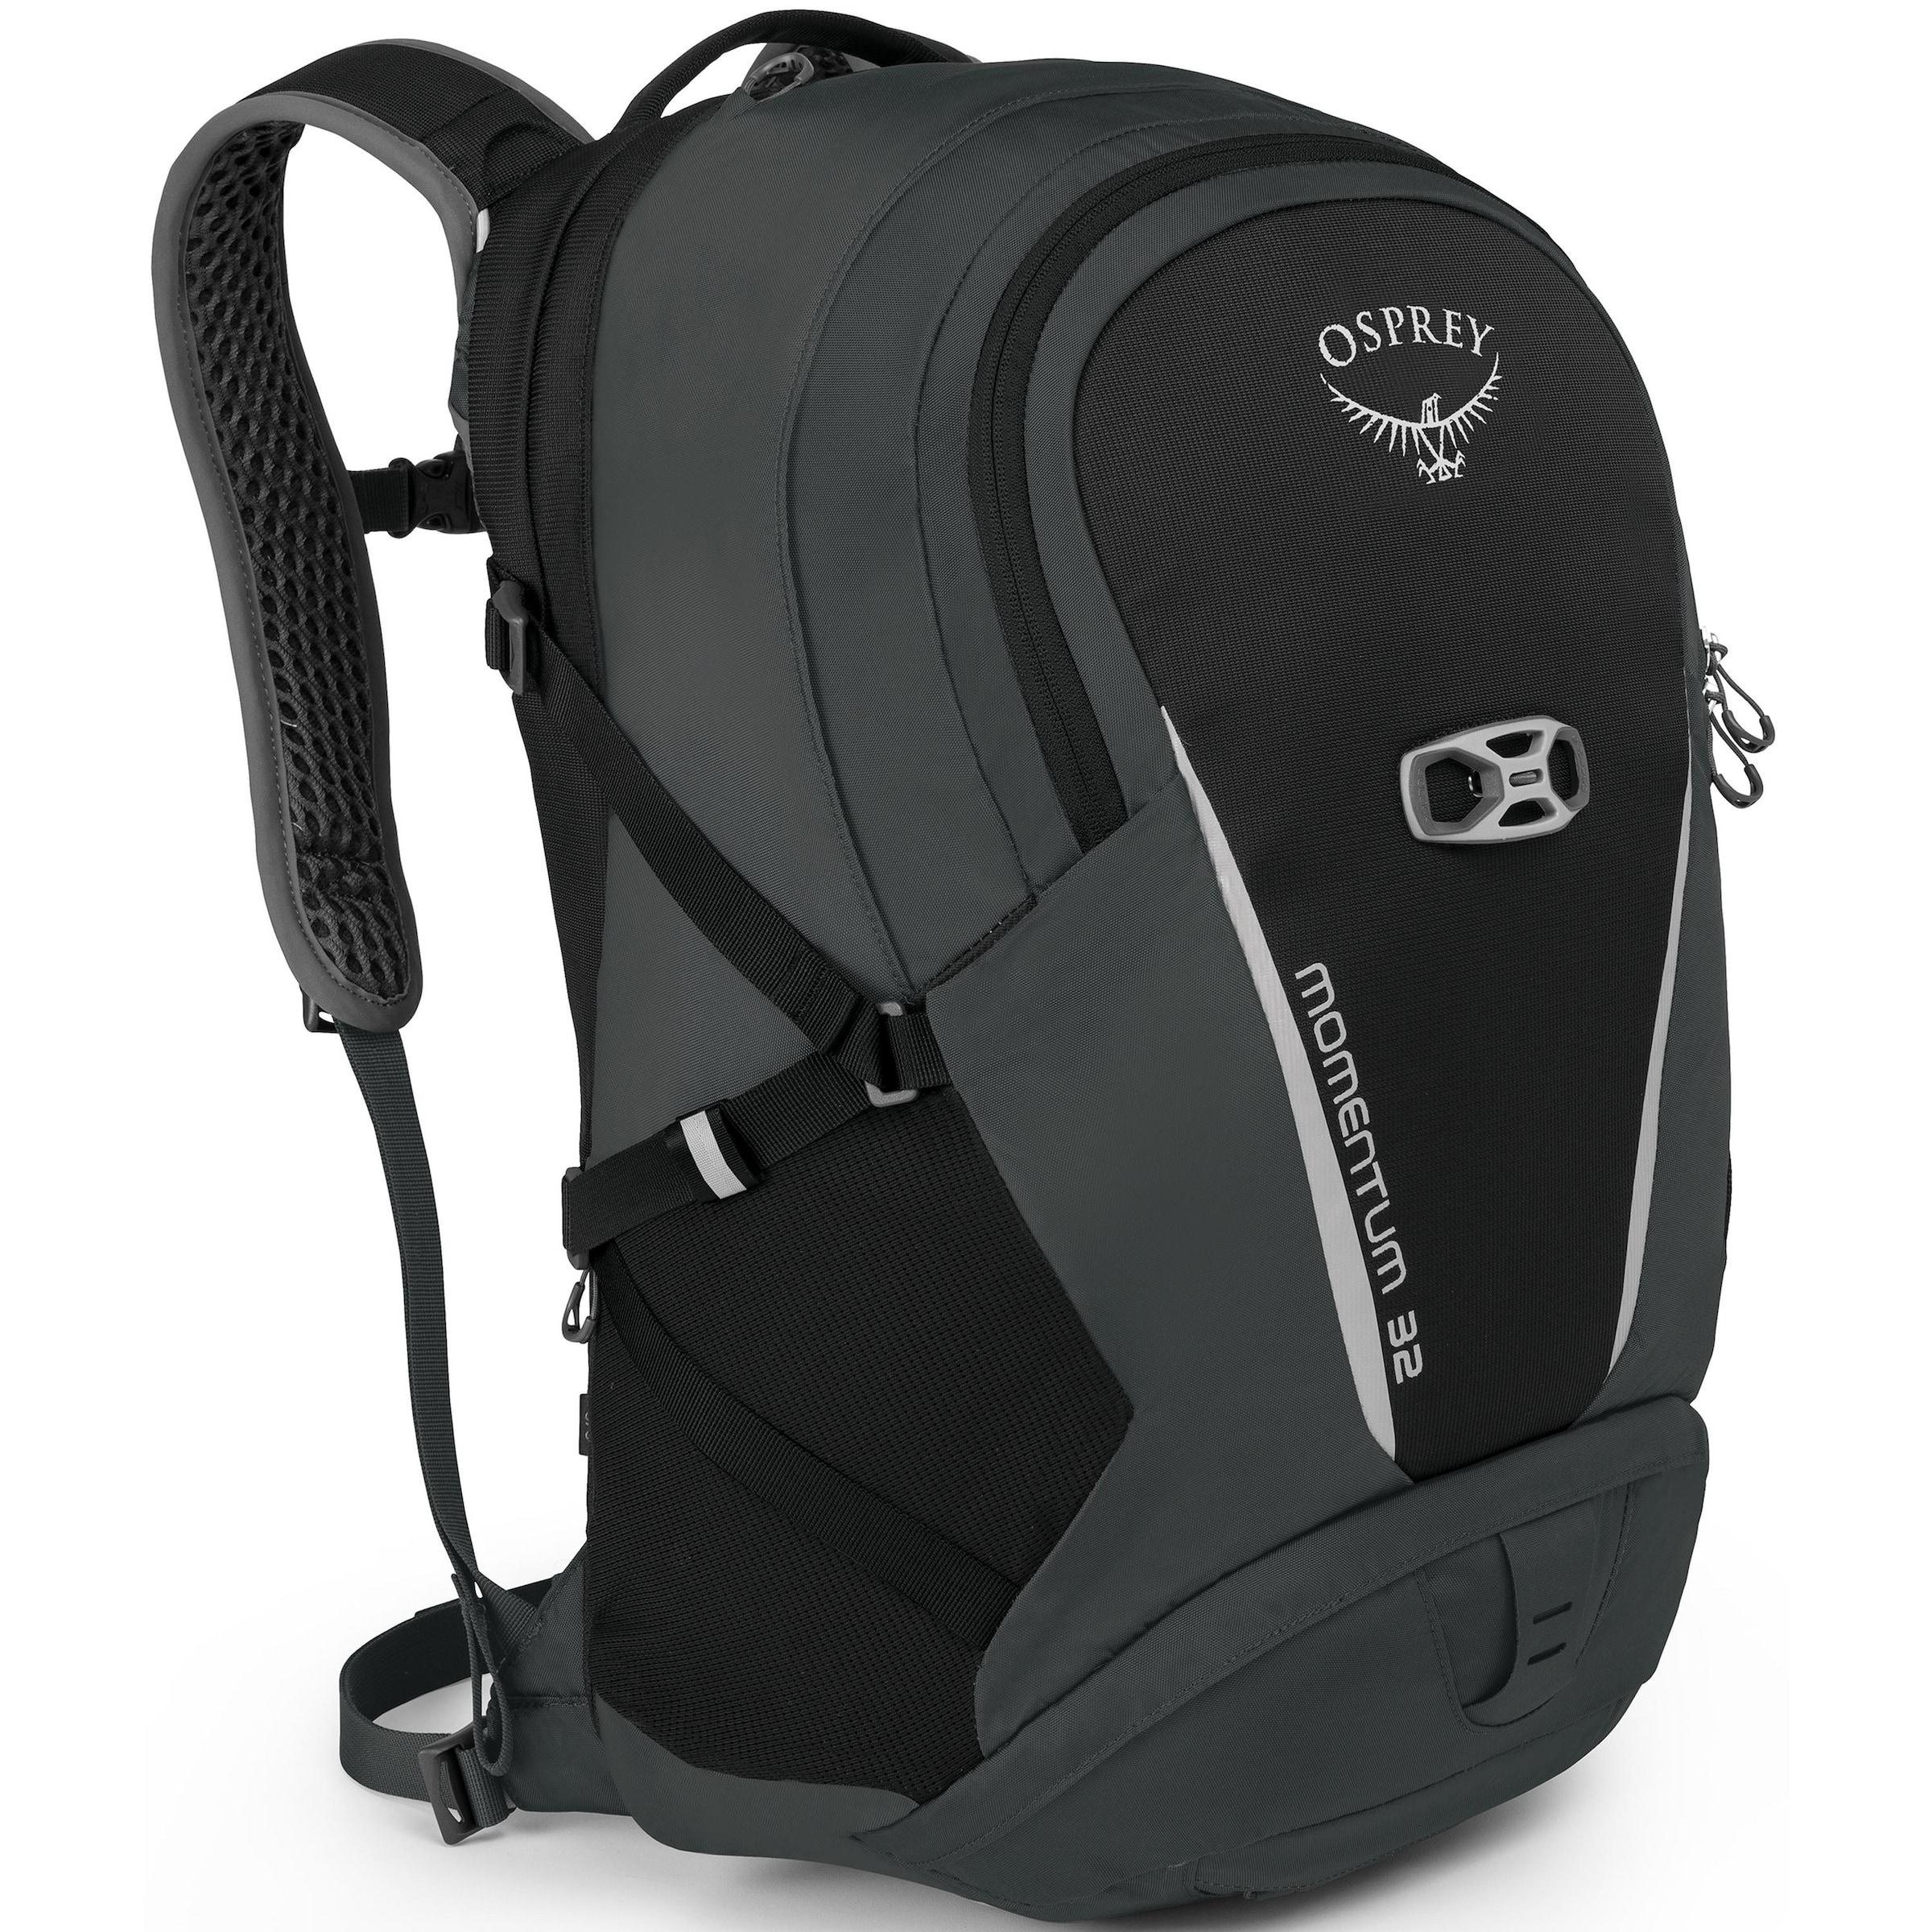 Osprey 'Momentum 32' Daypack Outlet Factory Outlet Billigshop SZDxogDK